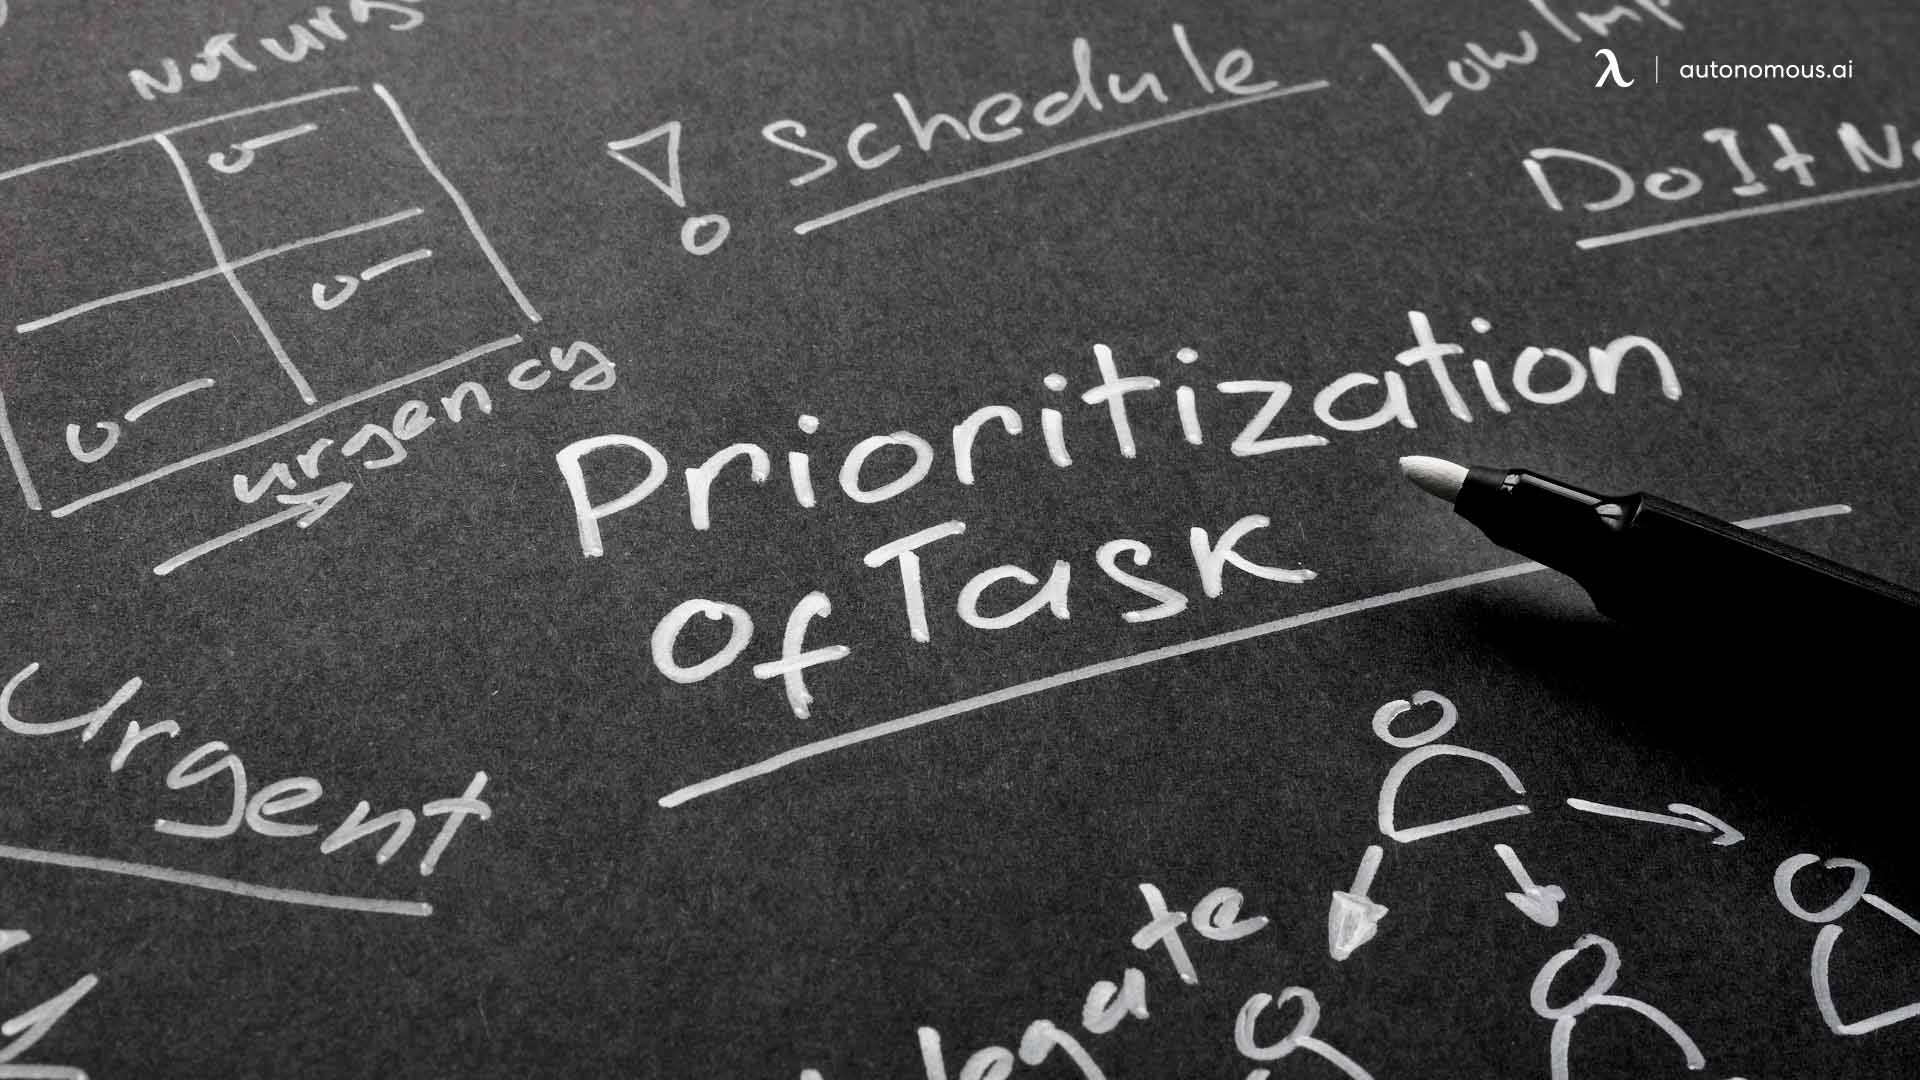 Prioritize work based on urgency